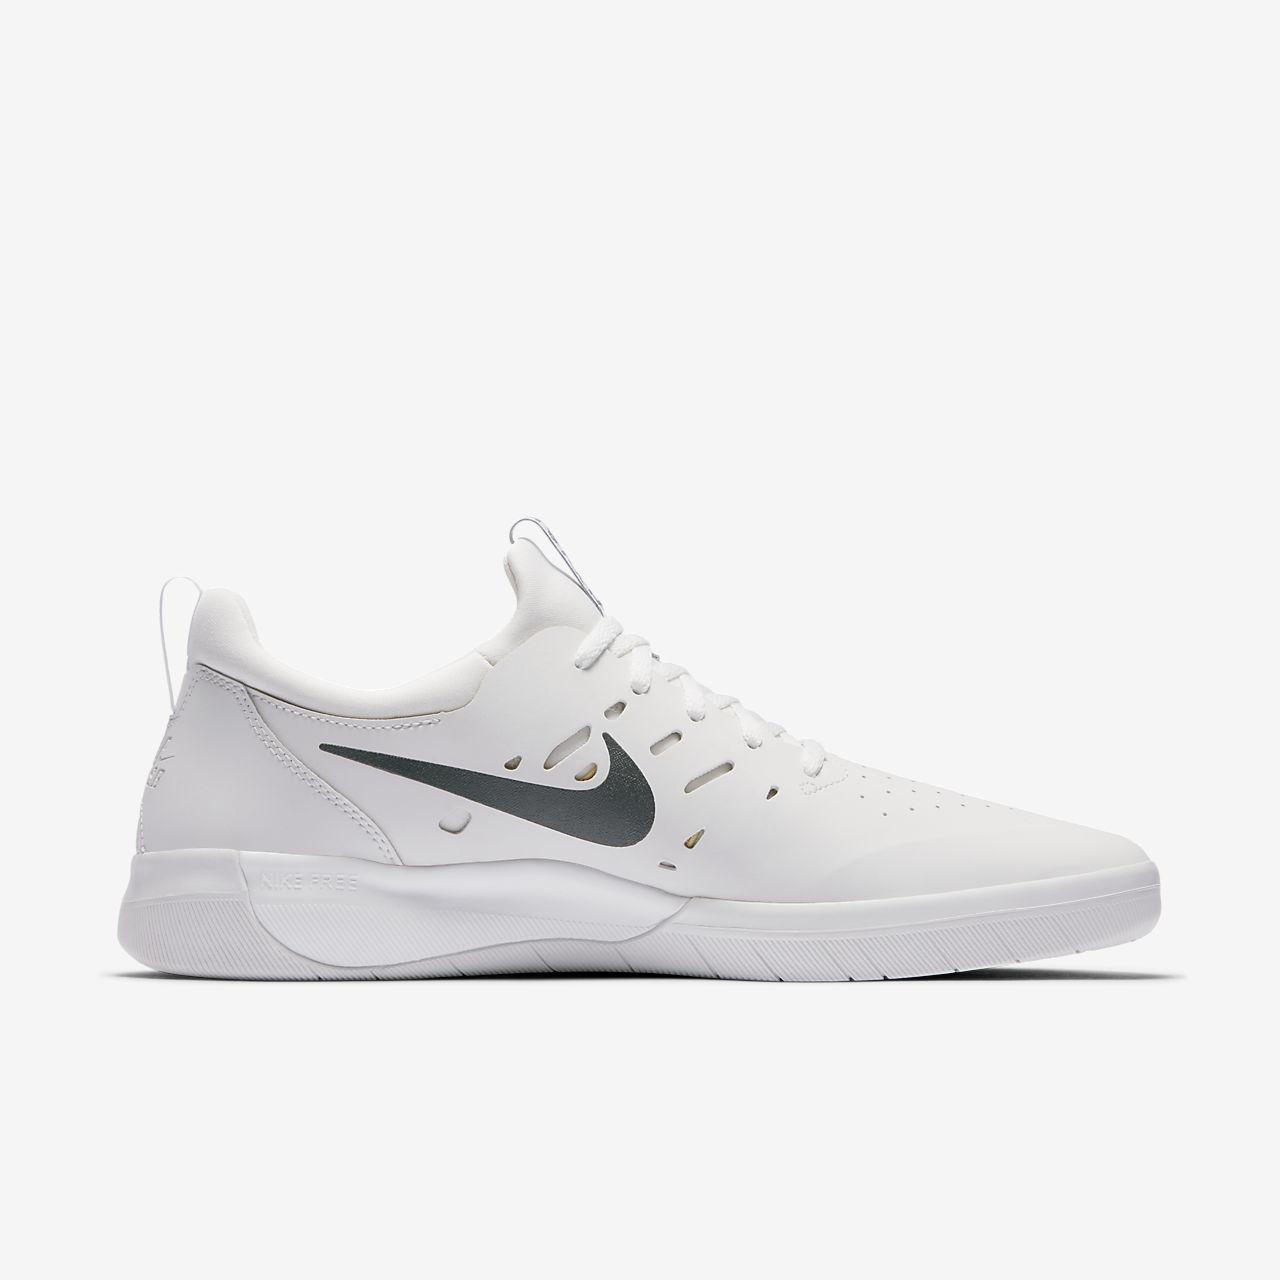 Nike Nyjah Chaussure De FreeFr Sb Skateboard WDH9IE2Y